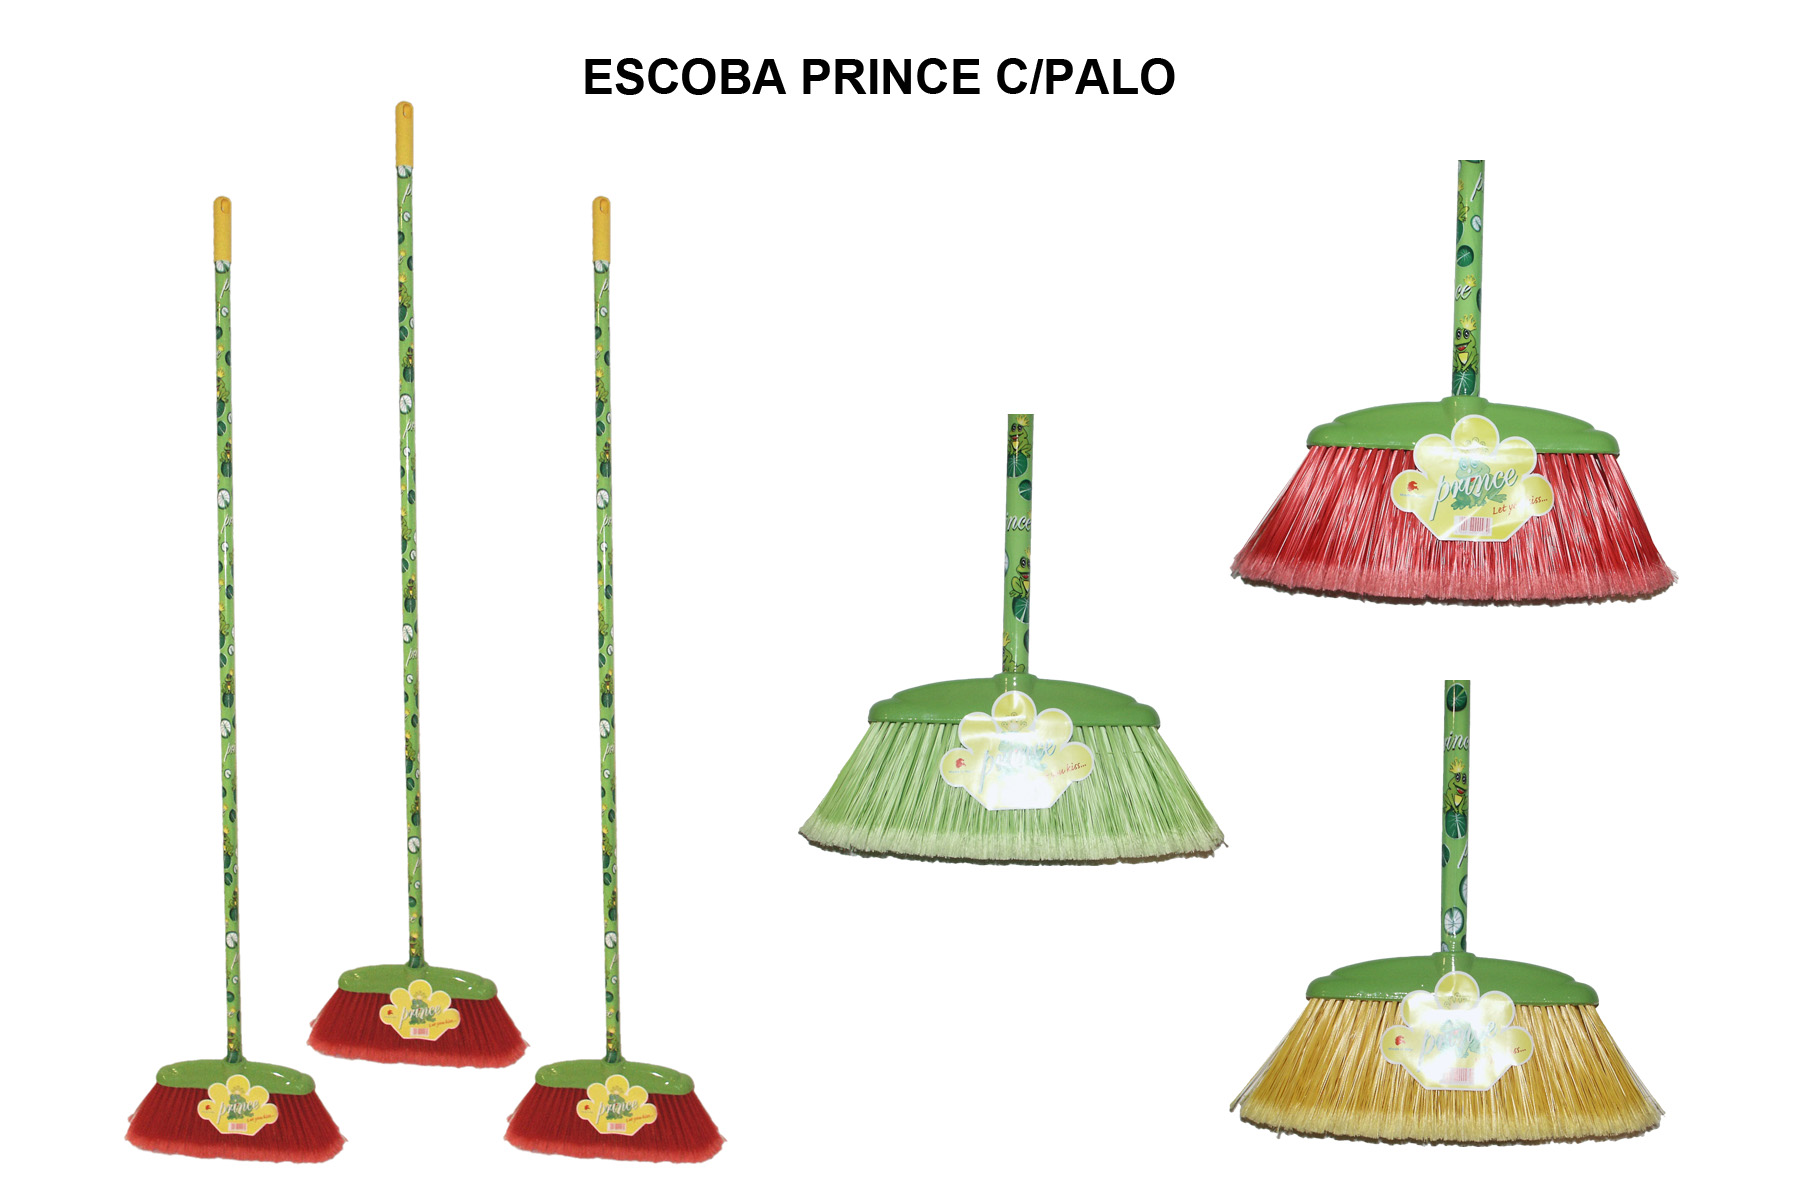 ESCOBA PRINCE C/PALO